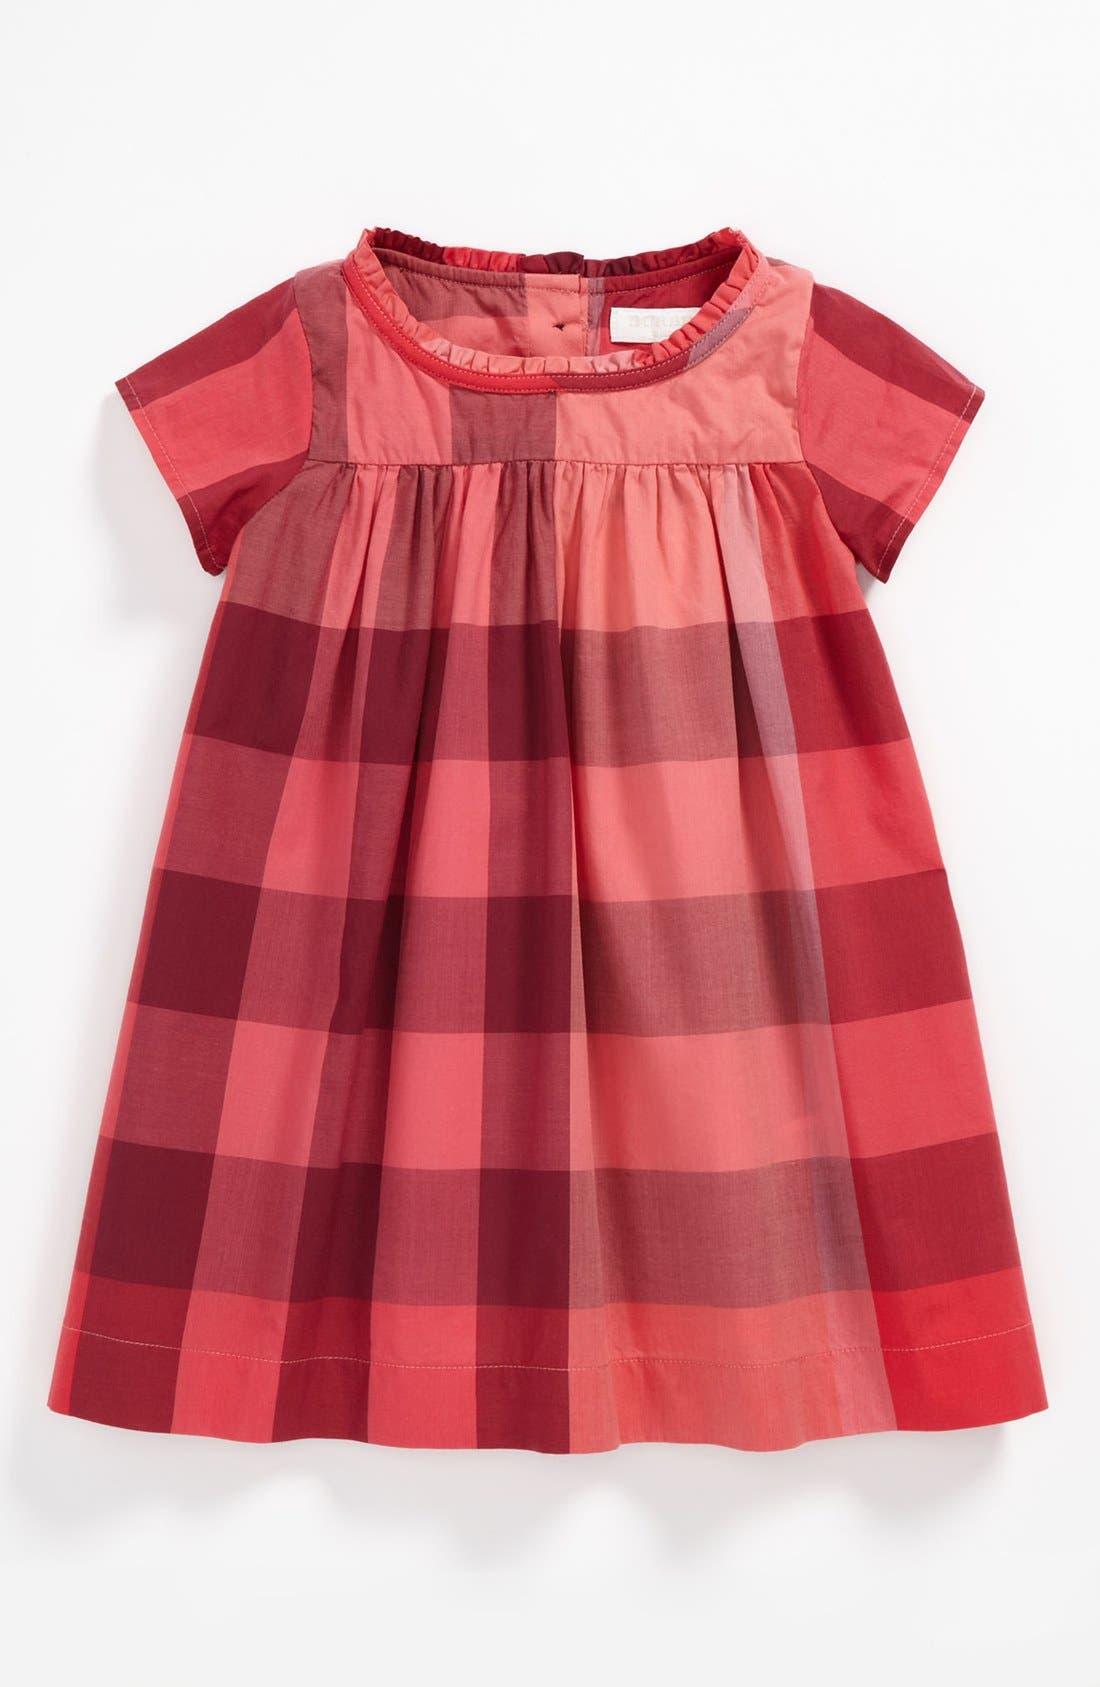 Alternate Image 1 Selected - Burberry 'Delia' Dress (Baby)